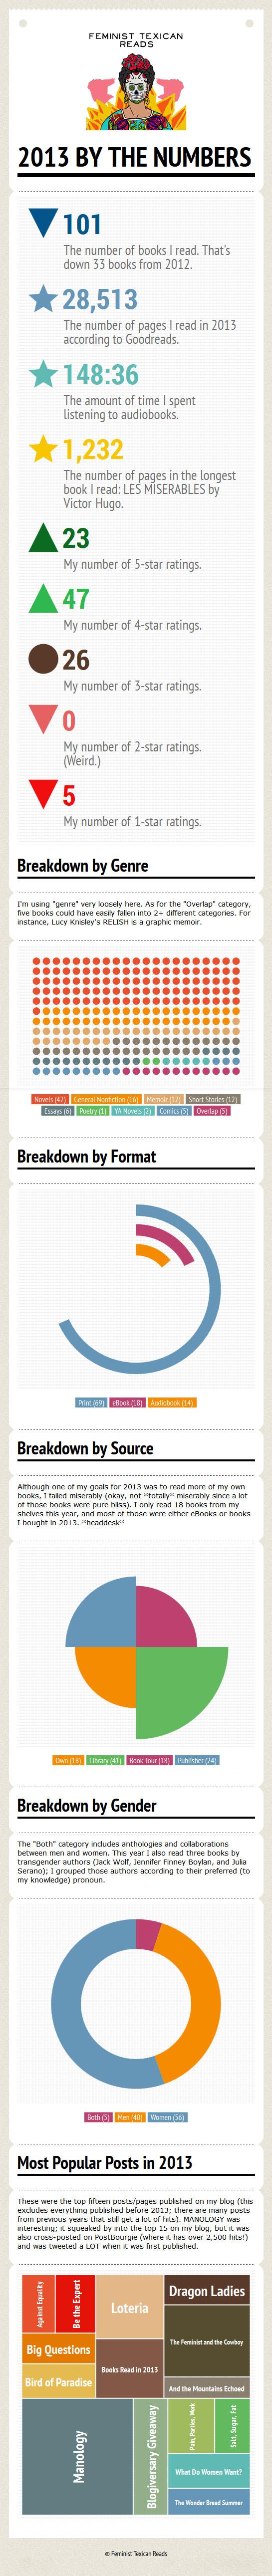 Feminist Texican Reads 2013 Infogram